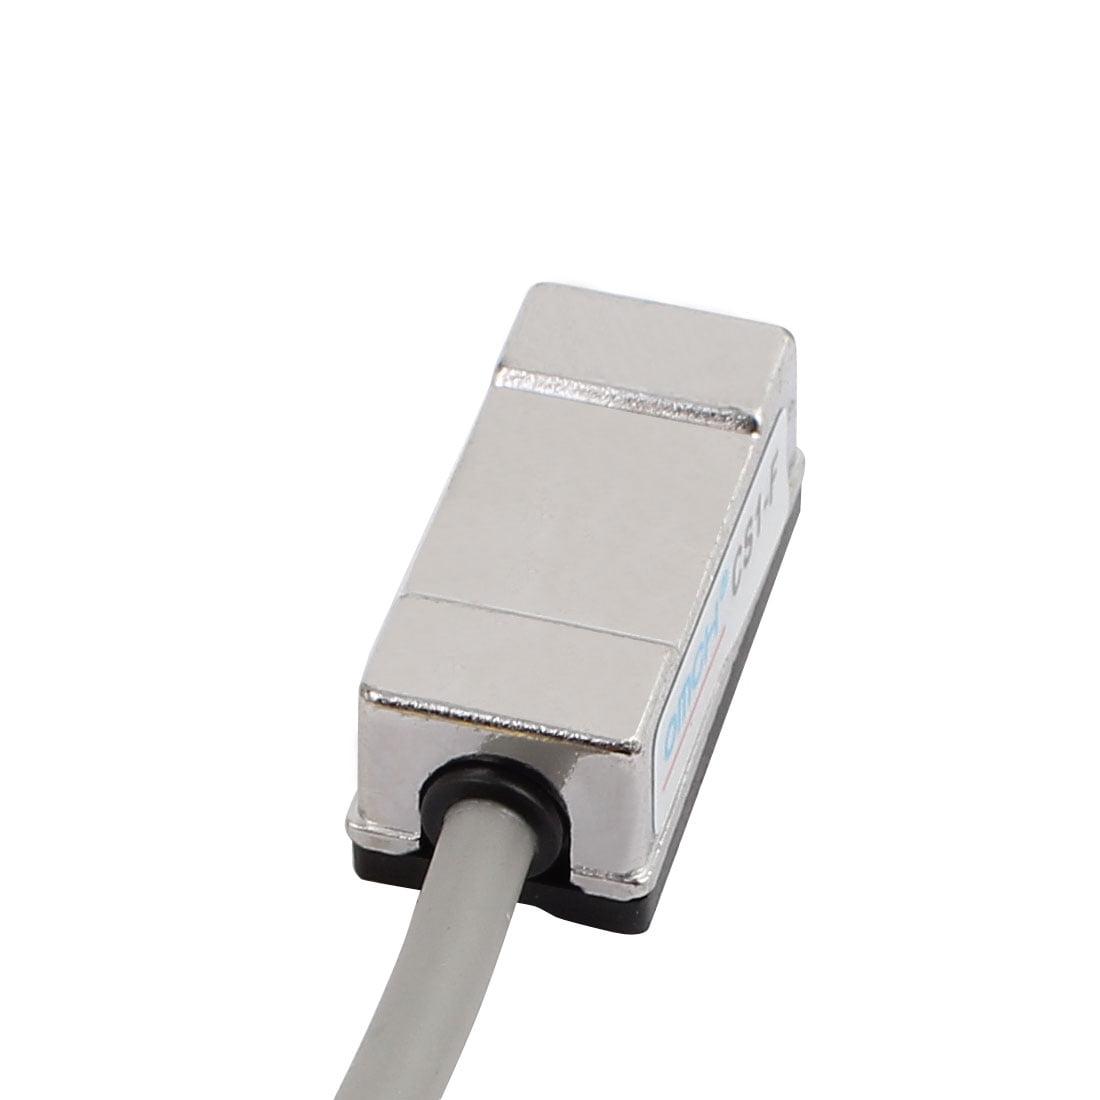 CS1-F /DC 5-240V 100mA 10W Magnetic Inductive Proximity Sensor Switch 2wire - image 2 de 4